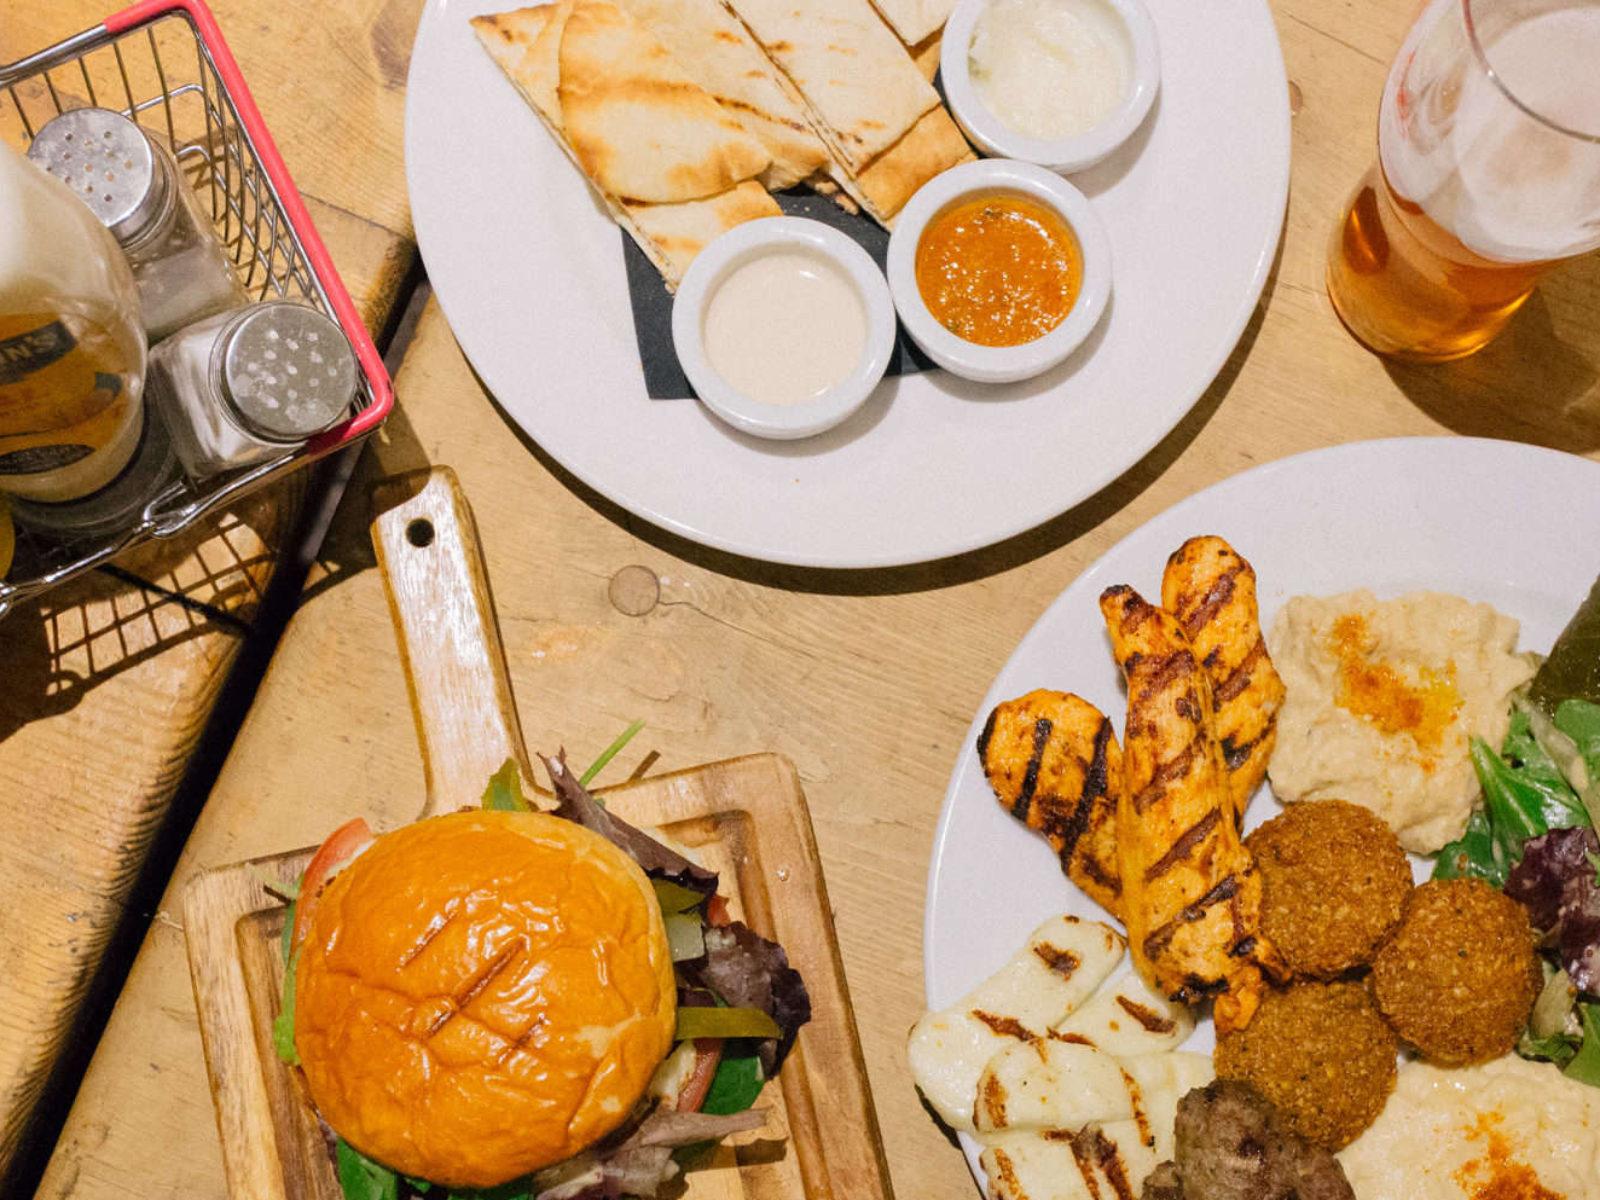 Our homemade burger, pita and mezze platter